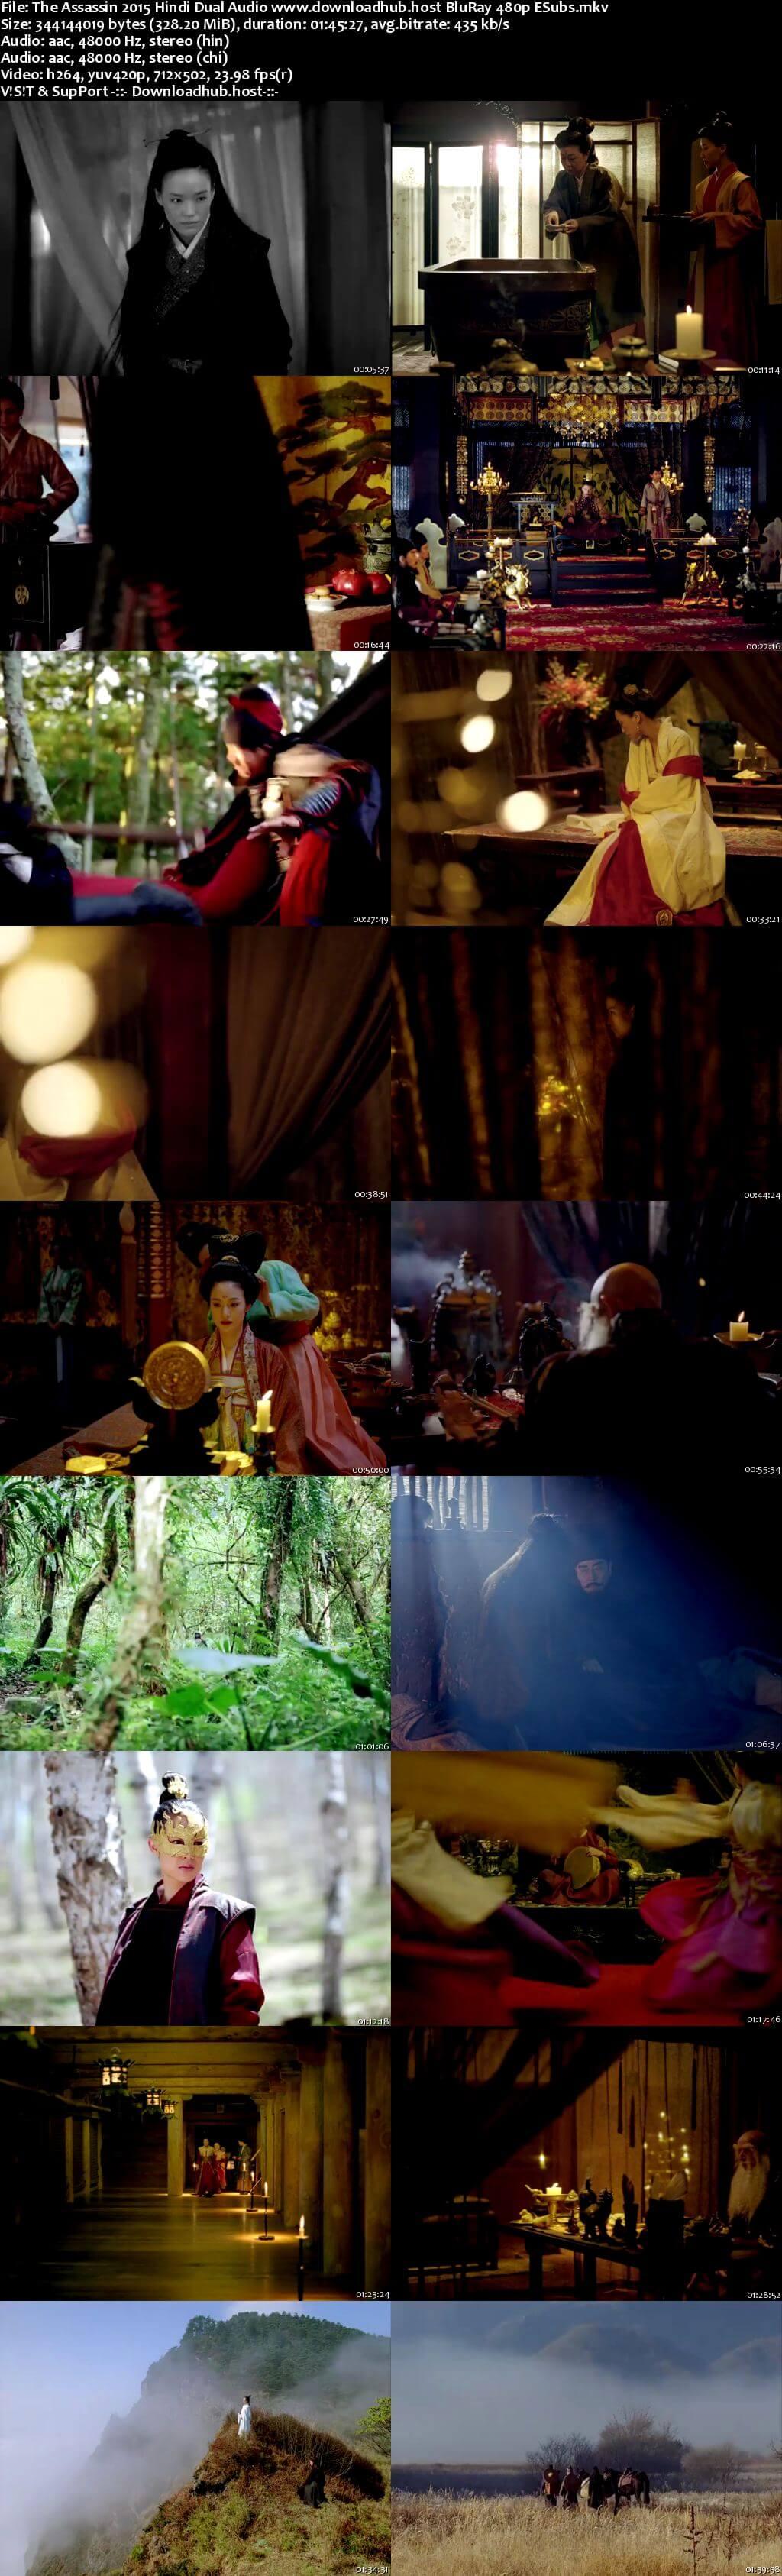 The Assassin 2015 Hindi Dual Audio 300MB BluRay 480p ESubs